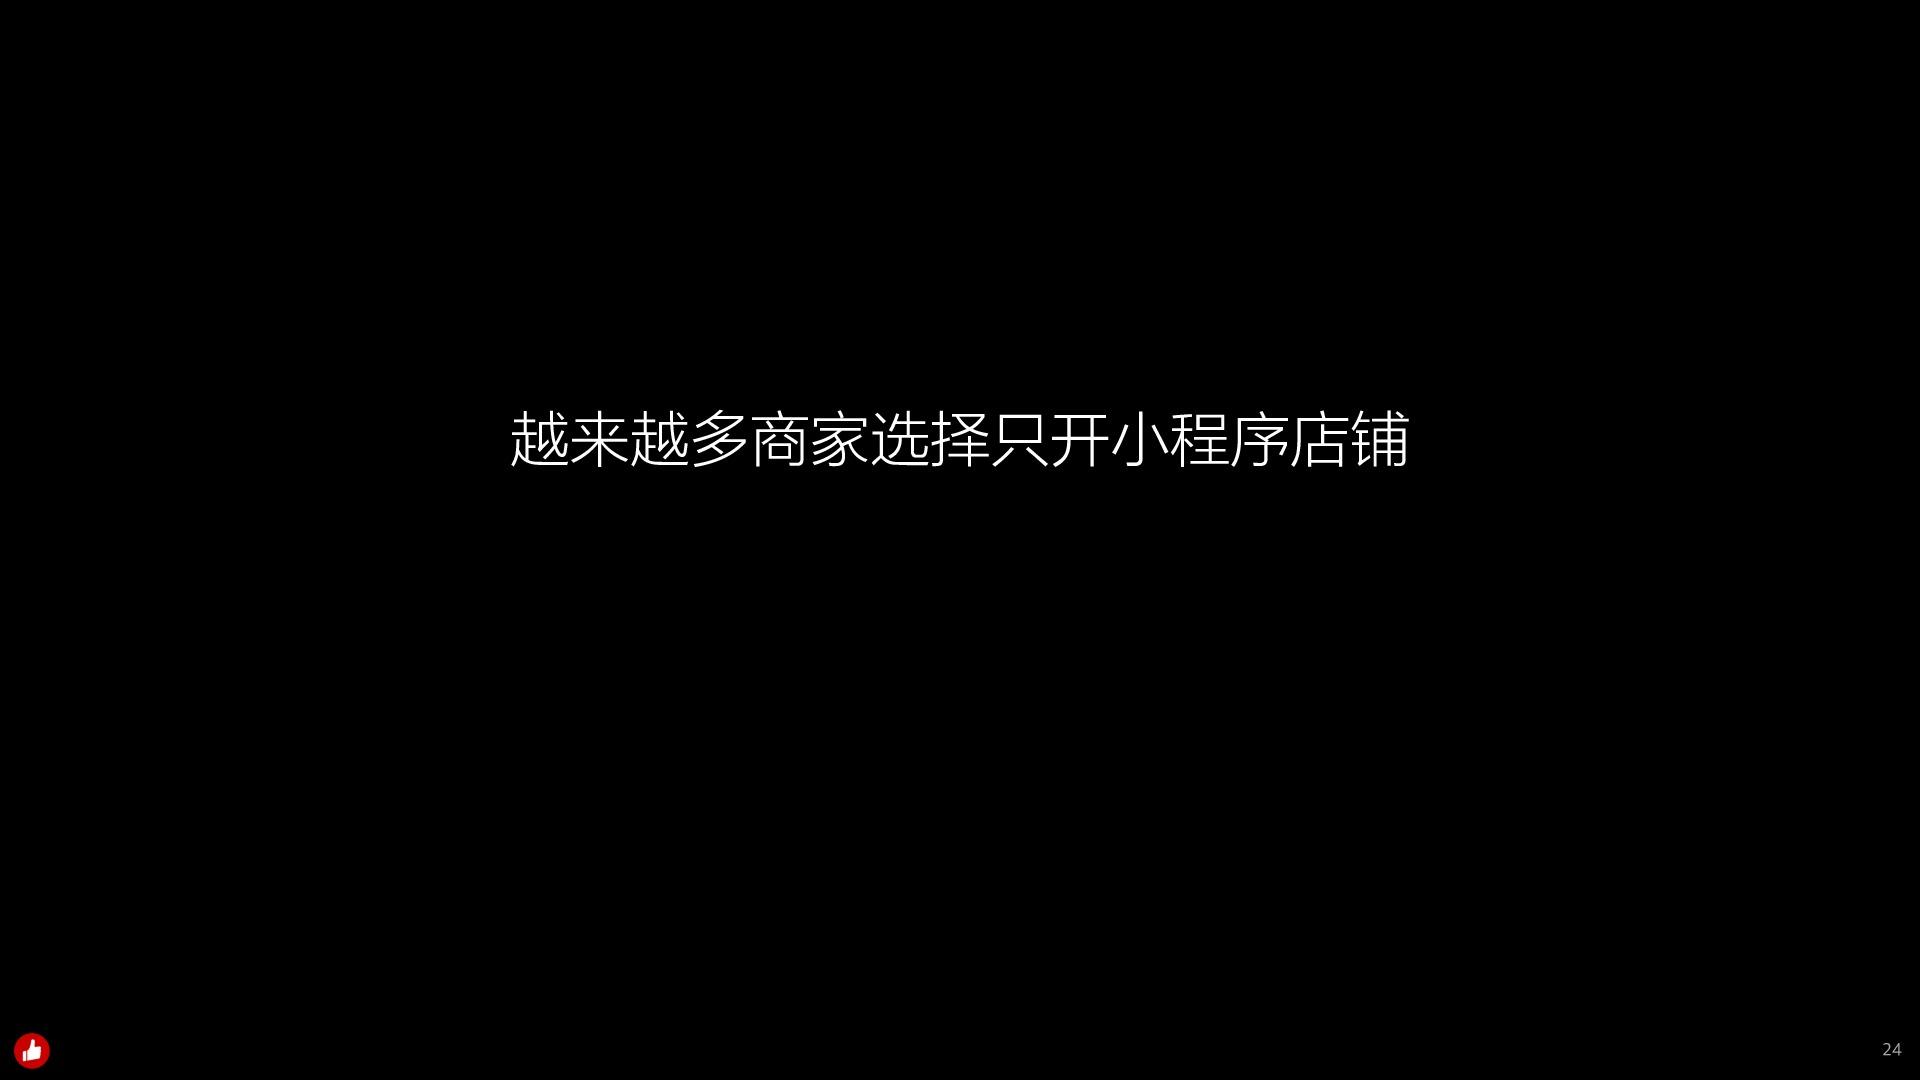 https://opentalk-blog.b0.upaiyun.com/prod/2018-11-26/920887826915ef5d68a02b55c3670fe0